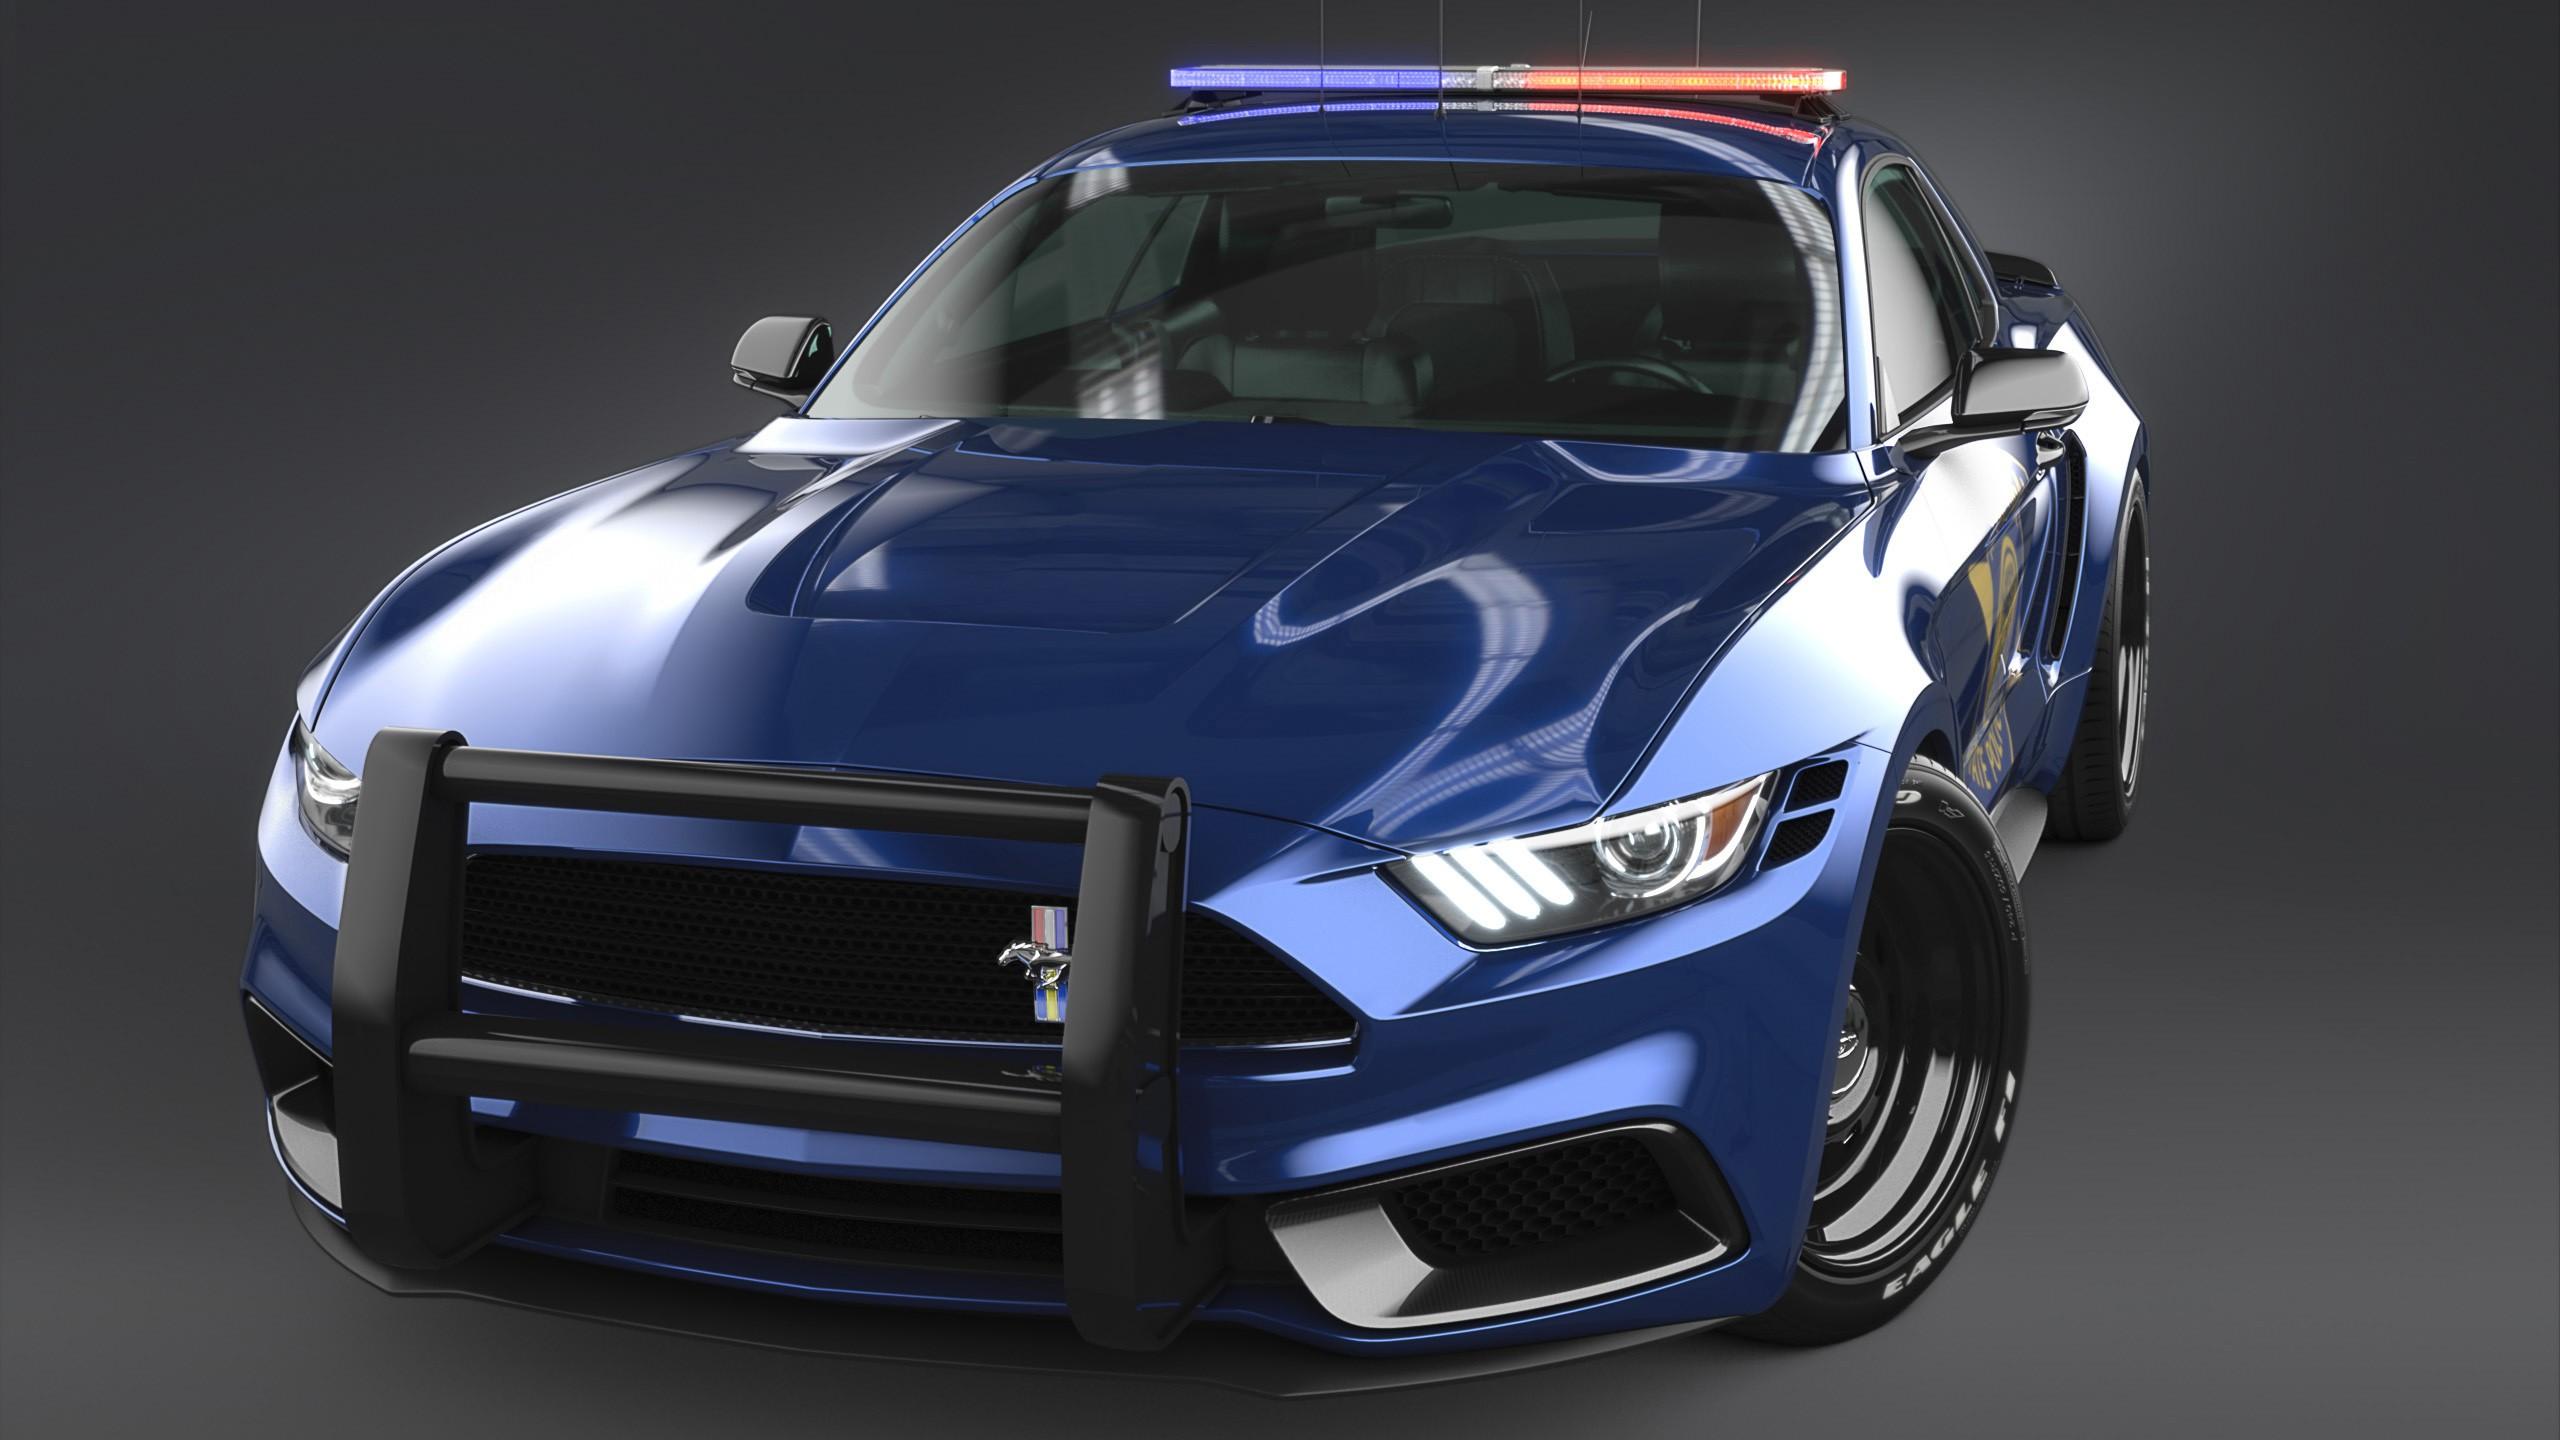 2017 Ford Mustang NotchBack Design Police 3 Wallpaper HD